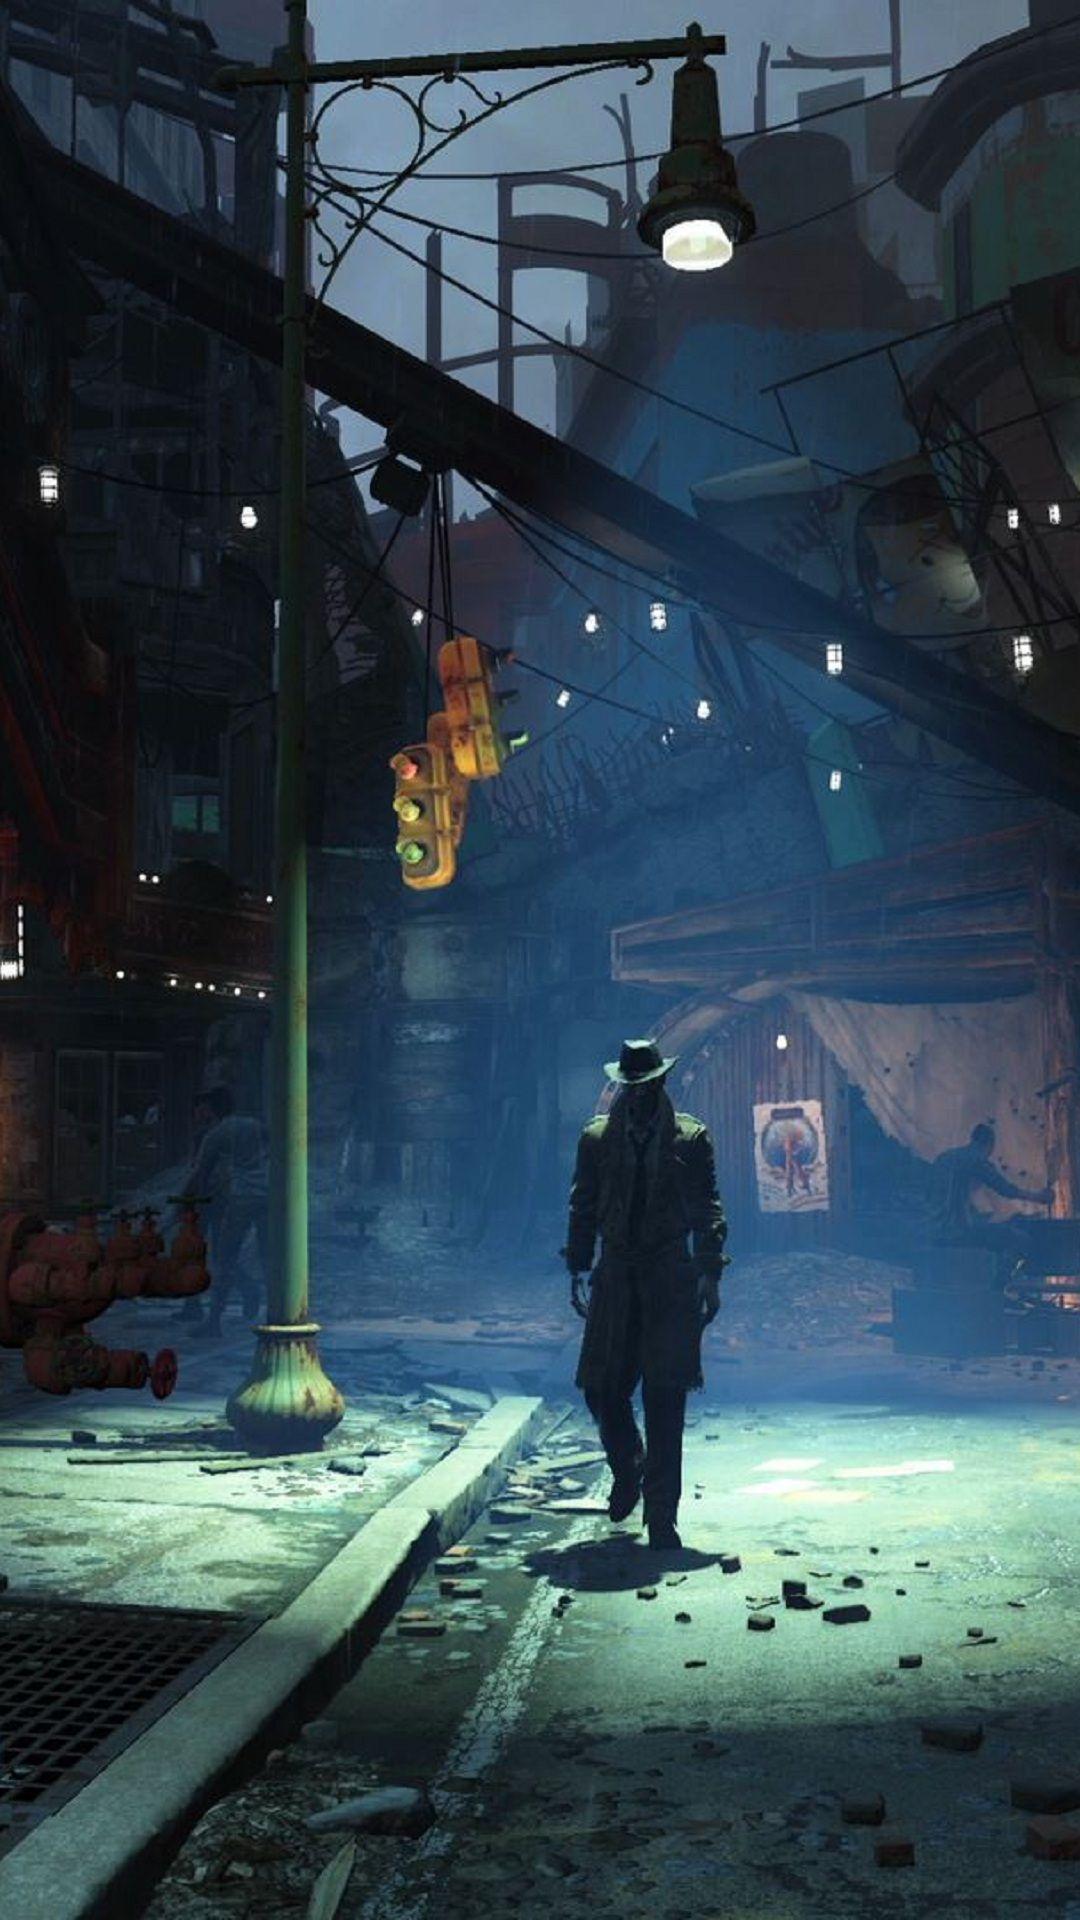 Fallout 4 1080x1920 Mobile Wallpapers Geek Fallout 4